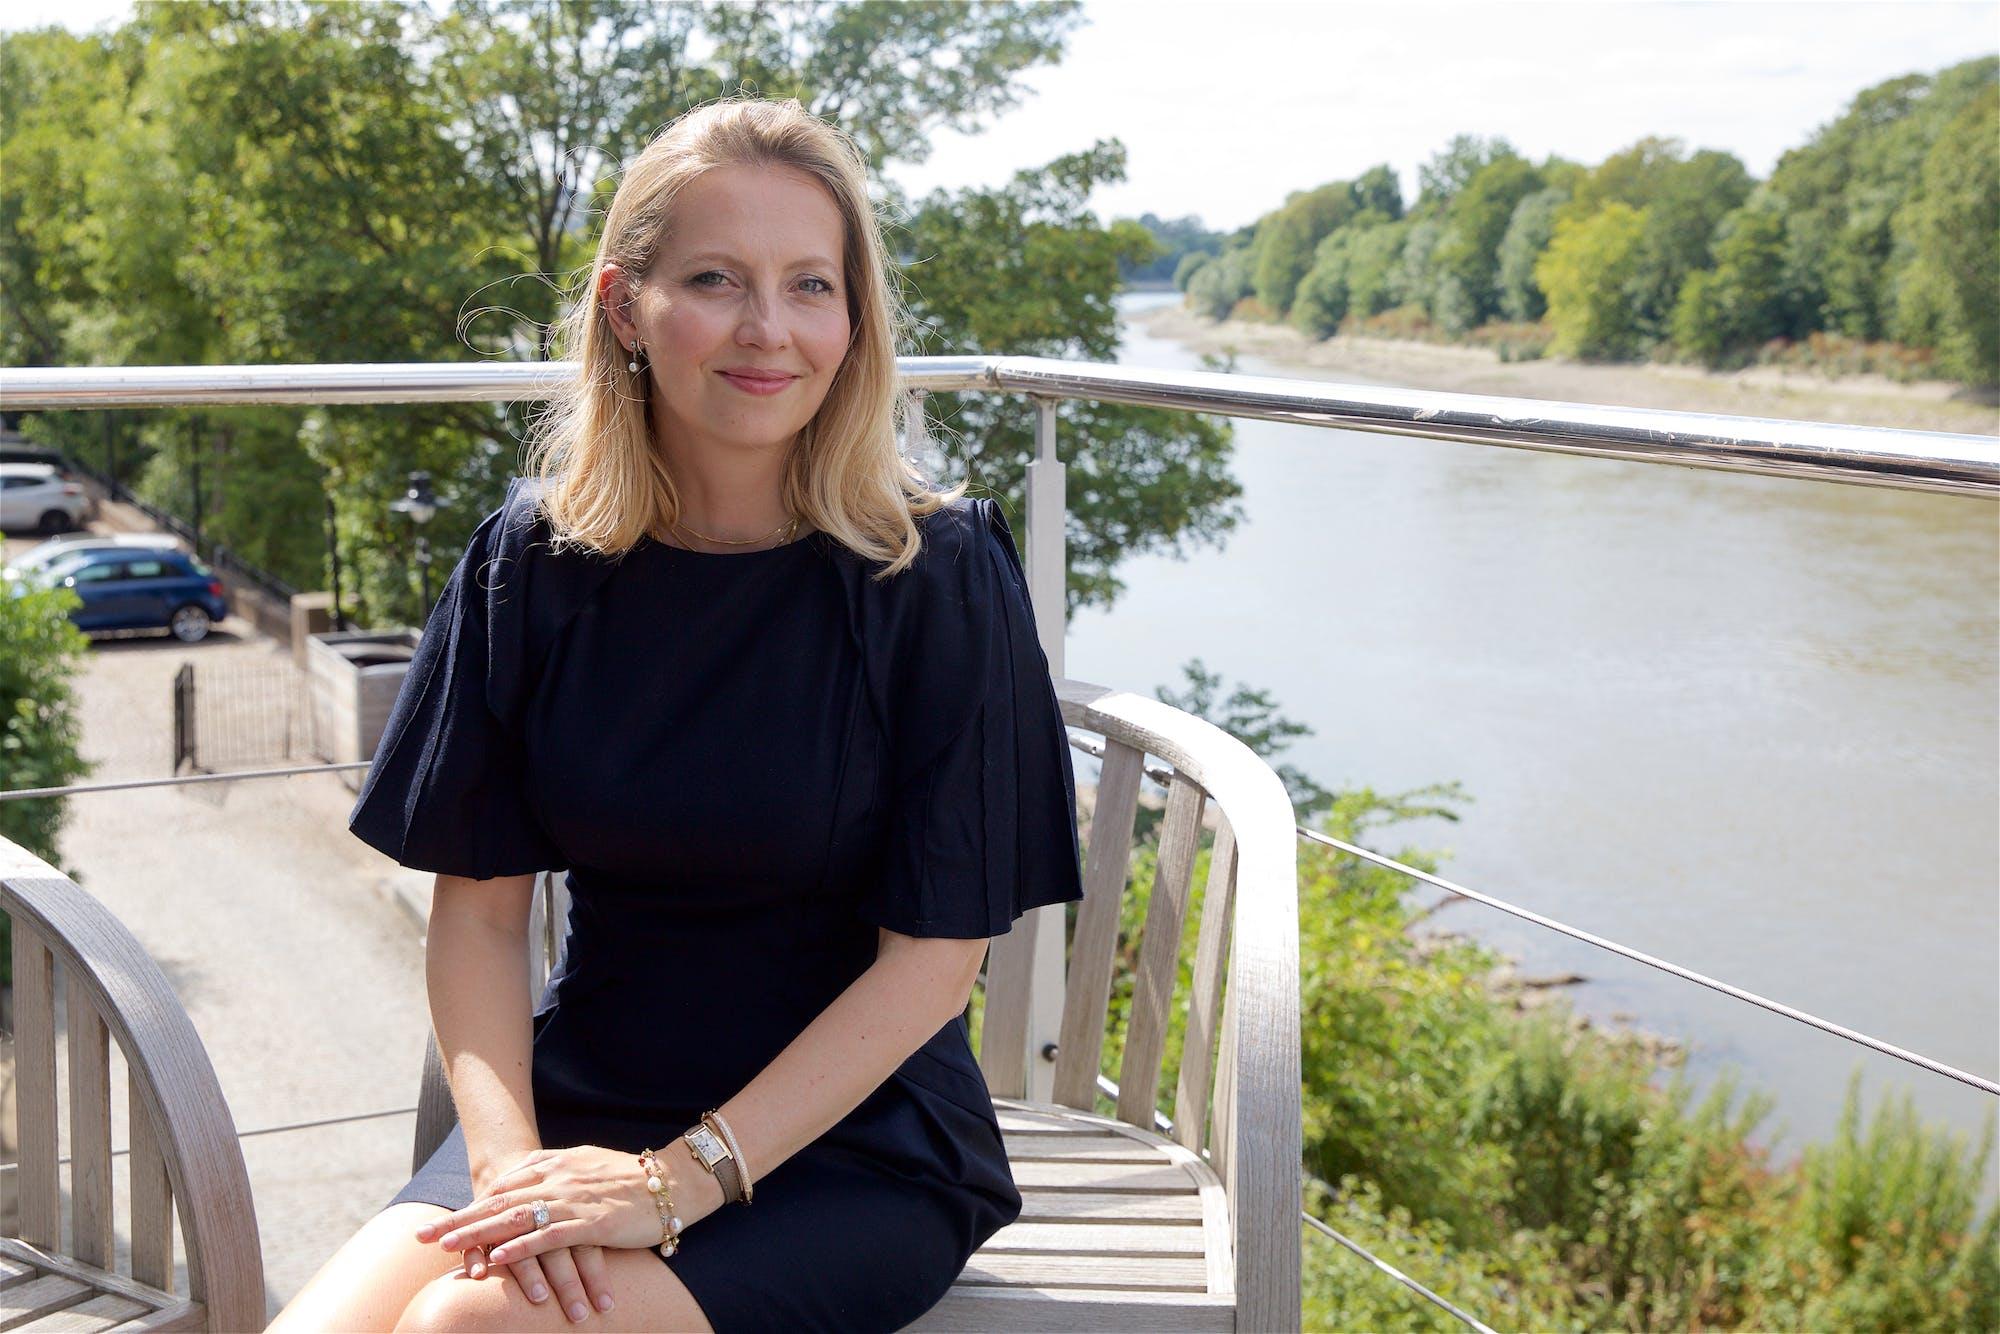 Navigating the Crisis  Aino-Leena Grapin on leading Winch Design through Covid-19